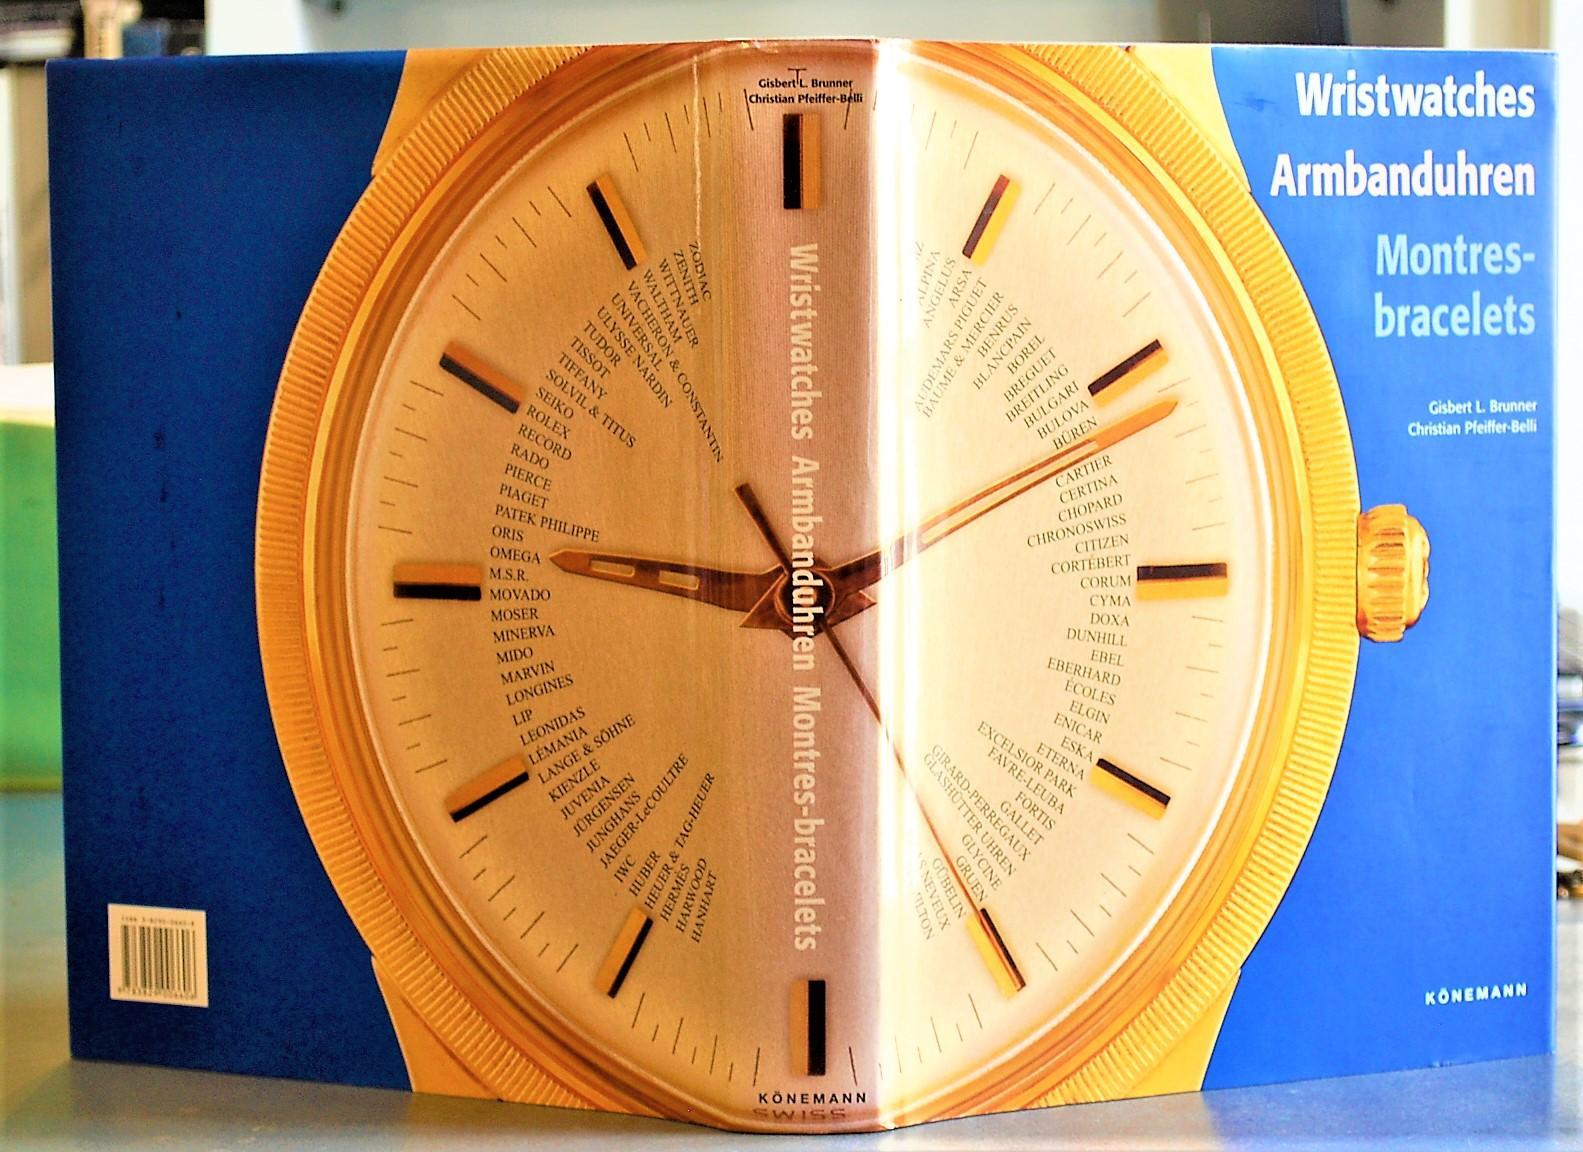 Wristwatches._Armbanduhren._Montres_-_Bracelets._Brunner,_Gisbert_[_]_[Hardcover]